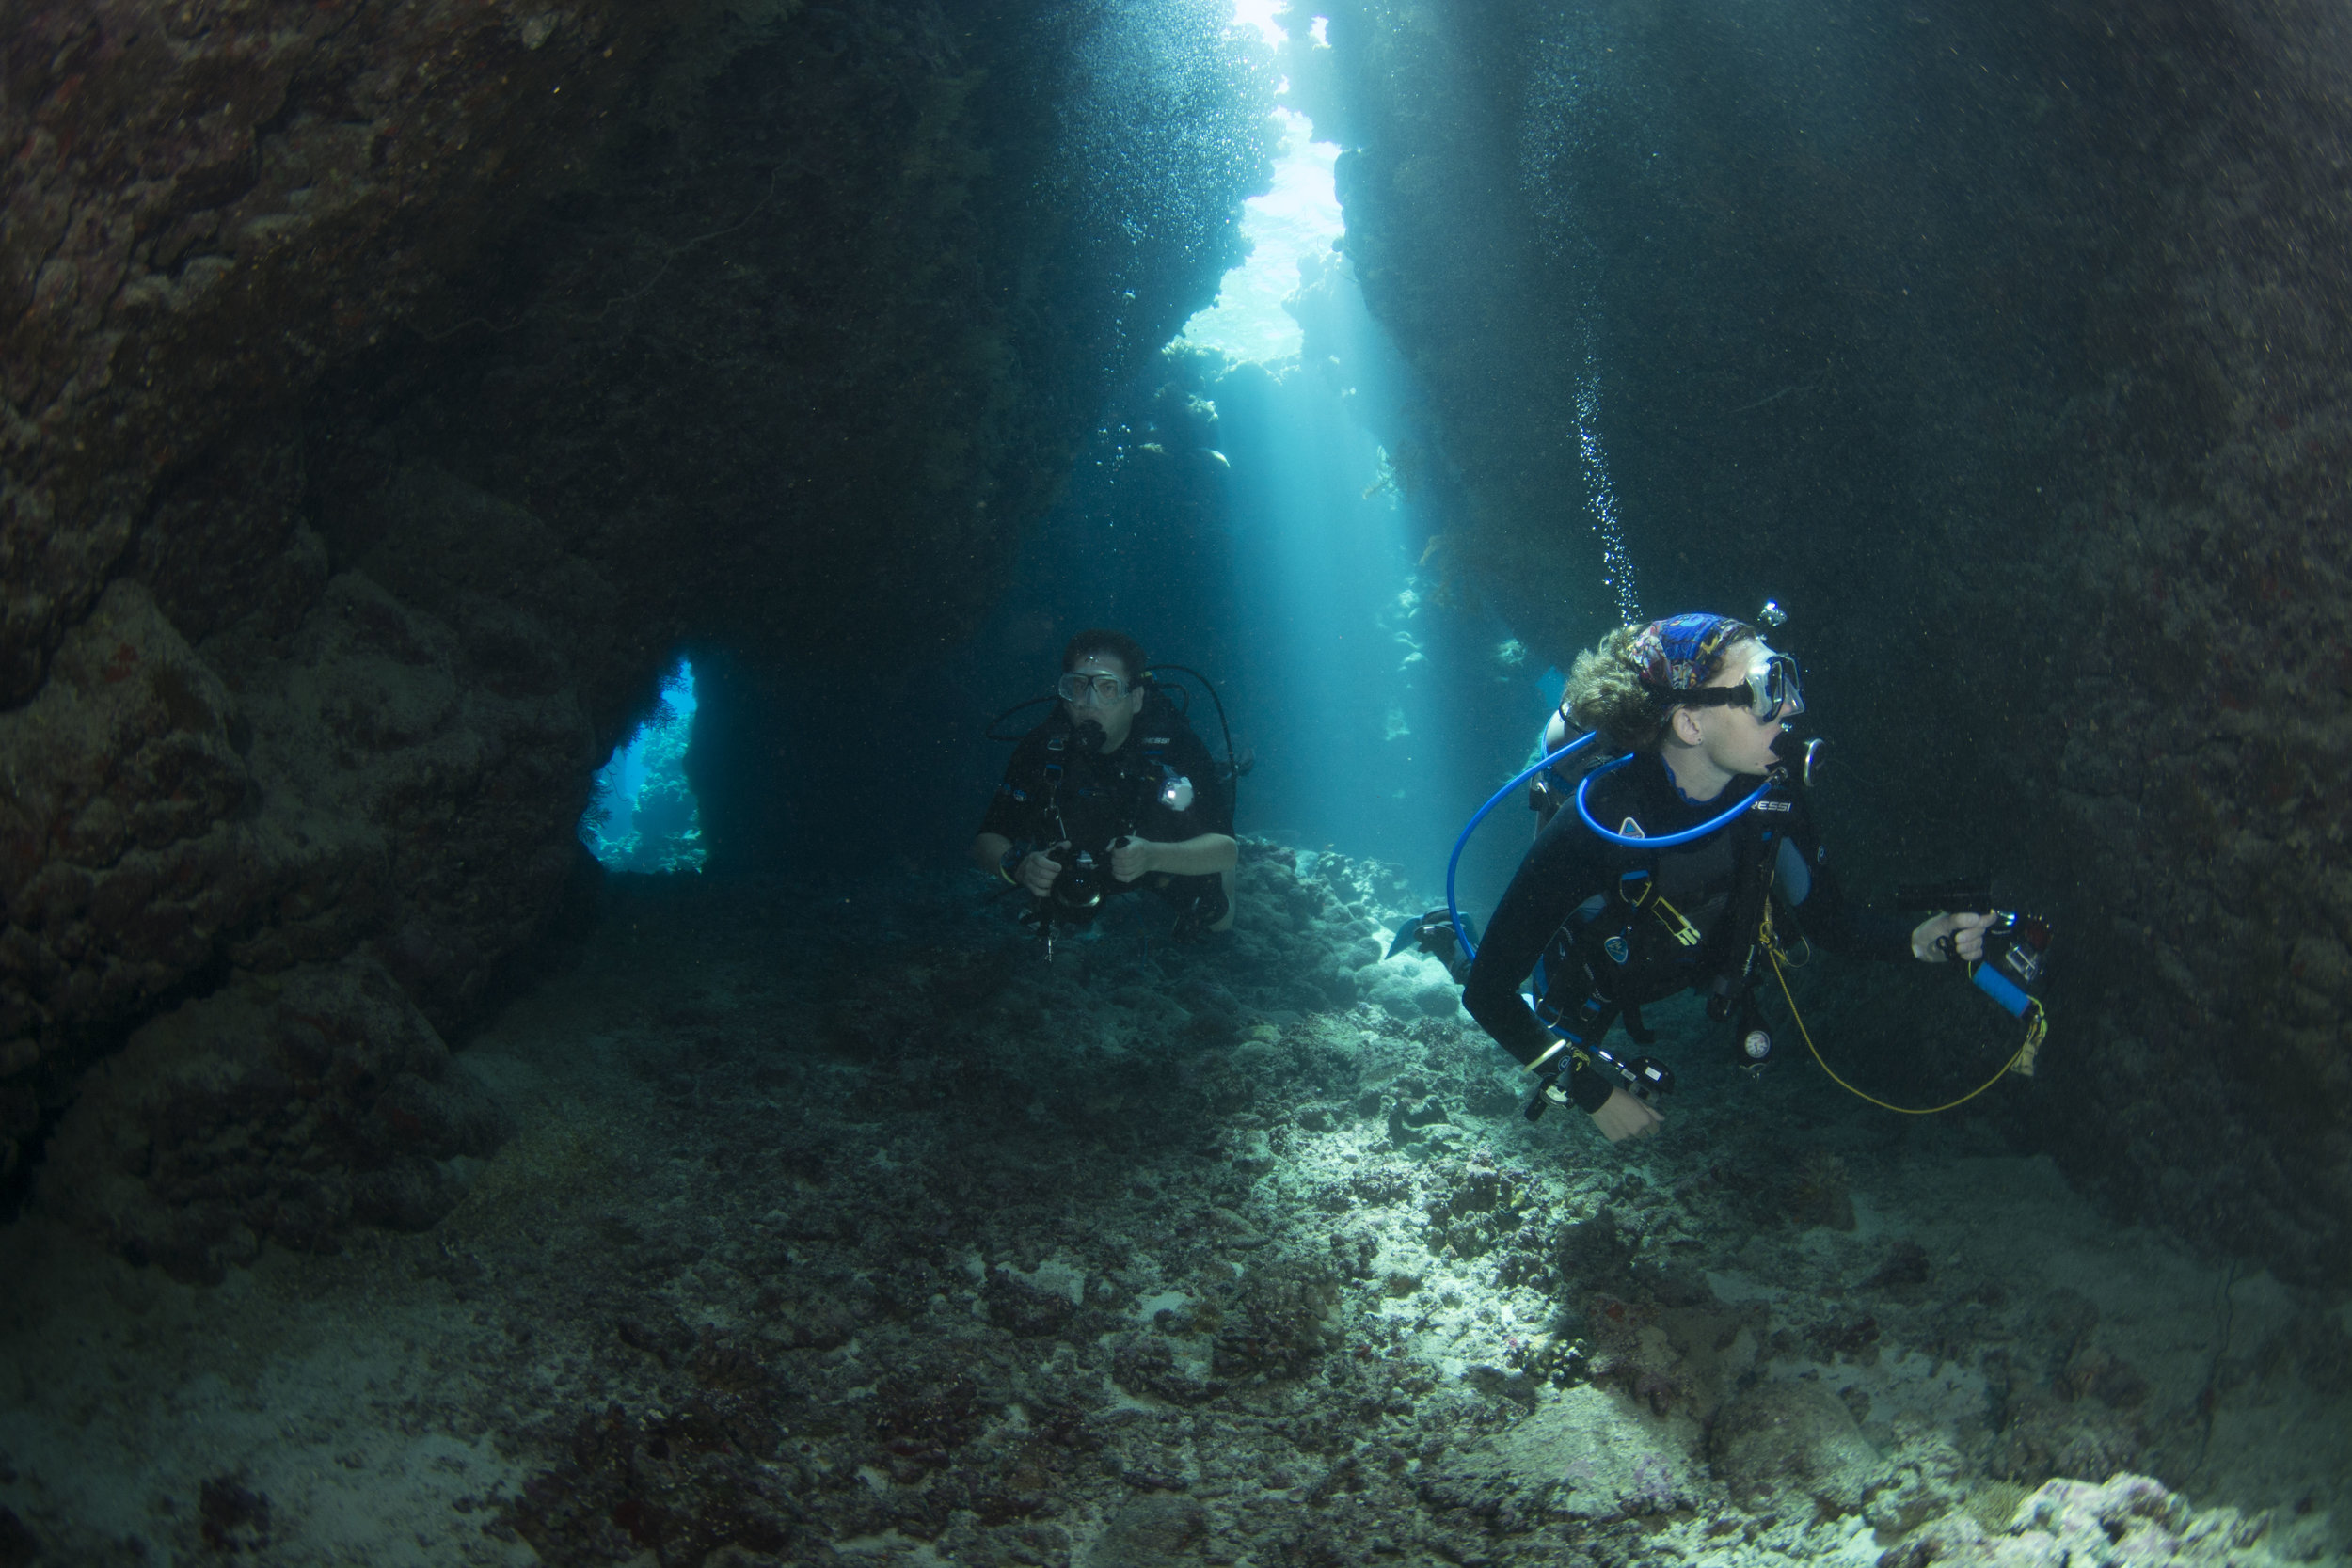 Divers through St Johns Woods